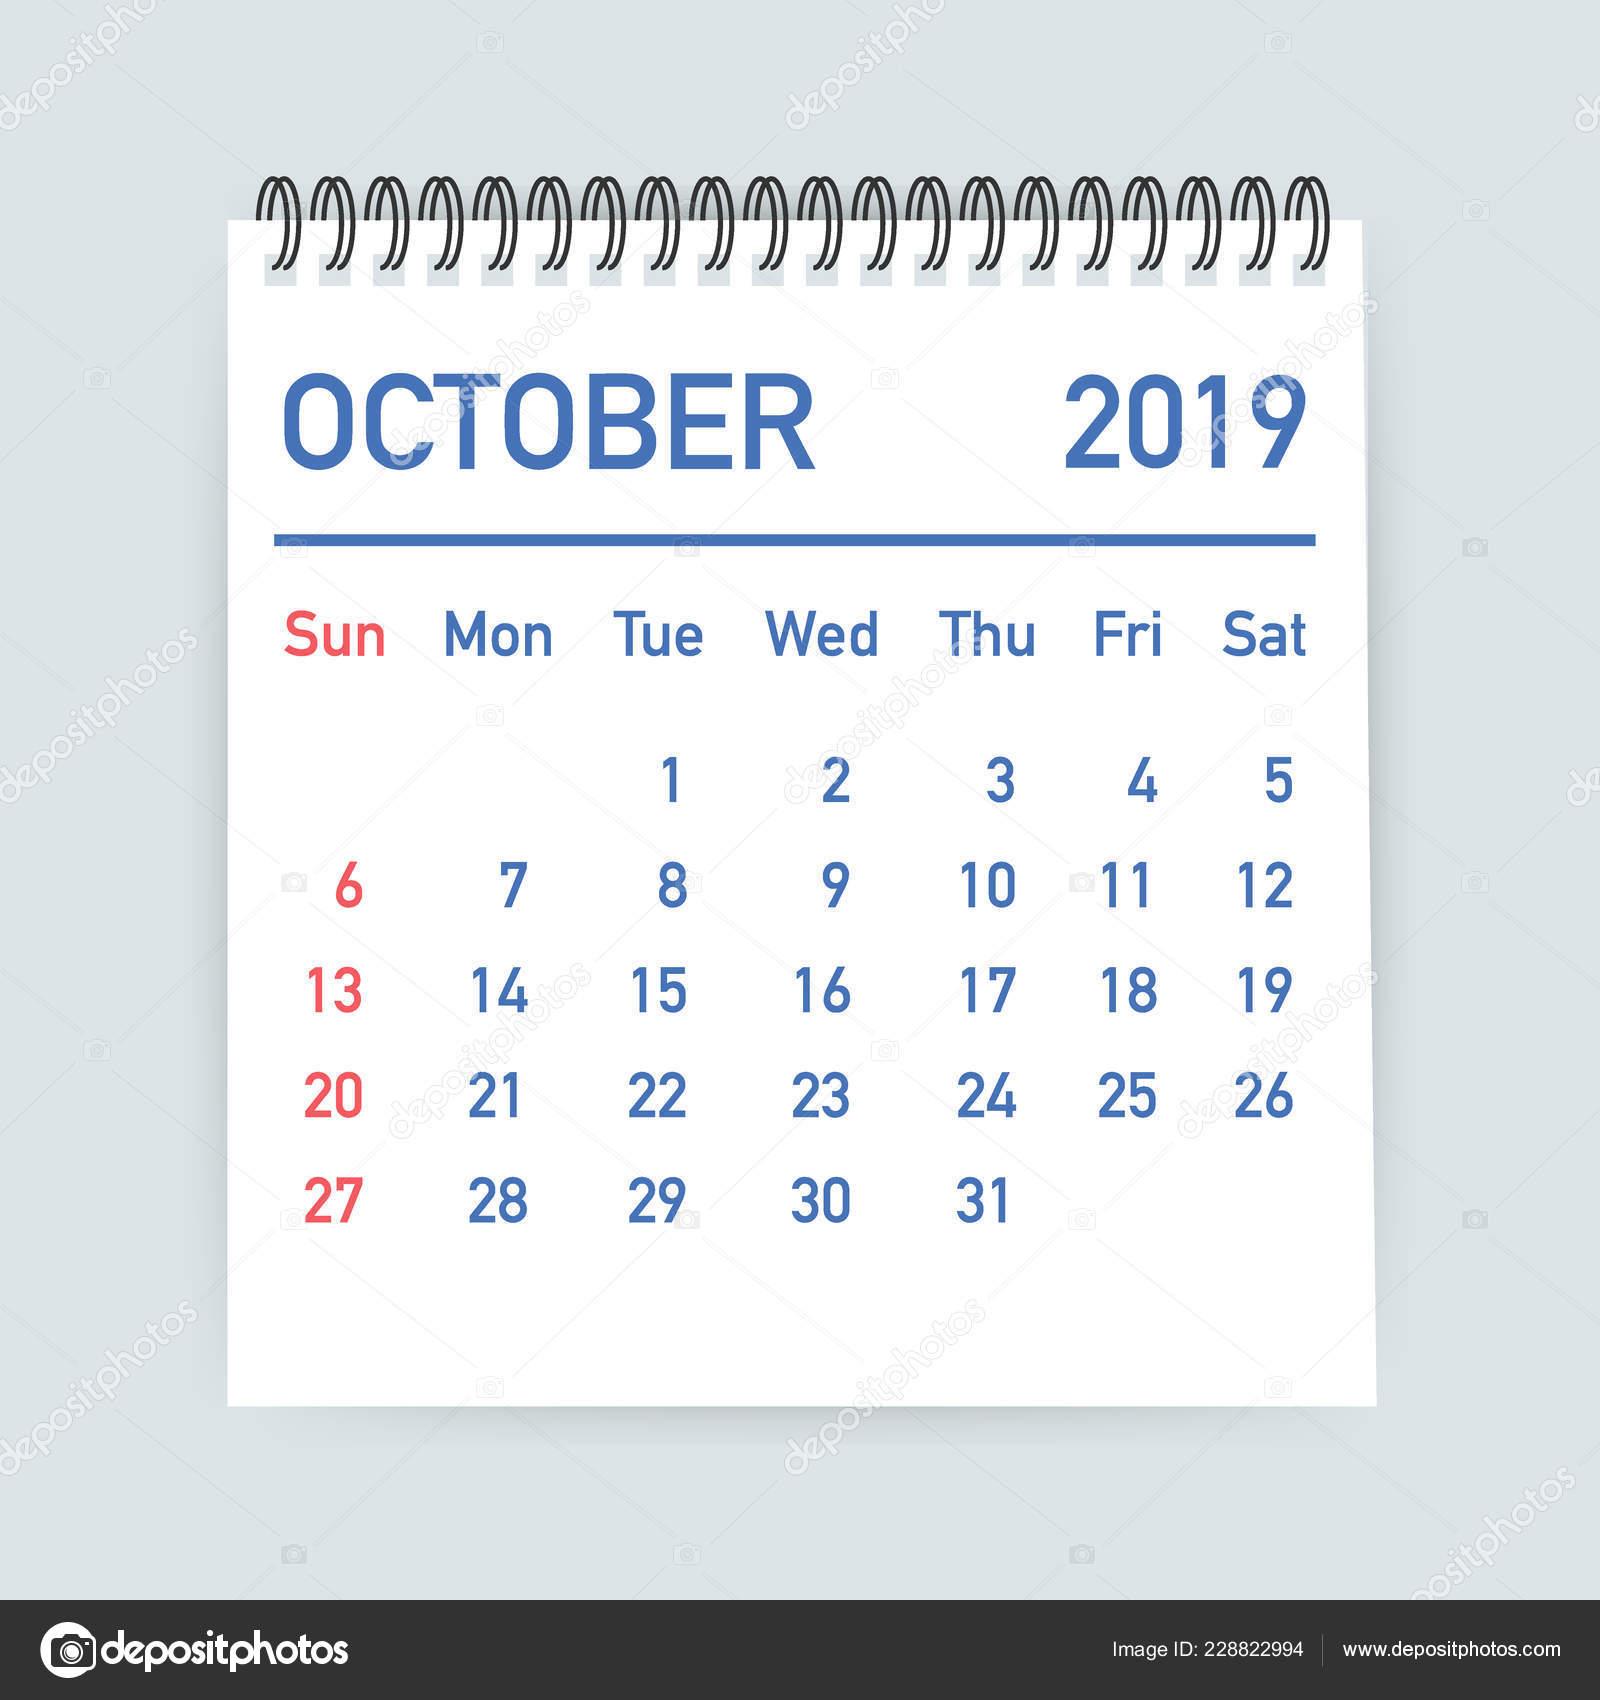 Octobre Calendrier 2019.Feuille De Calendrier Octobre 2019 Calendrier 2019 Dans Le